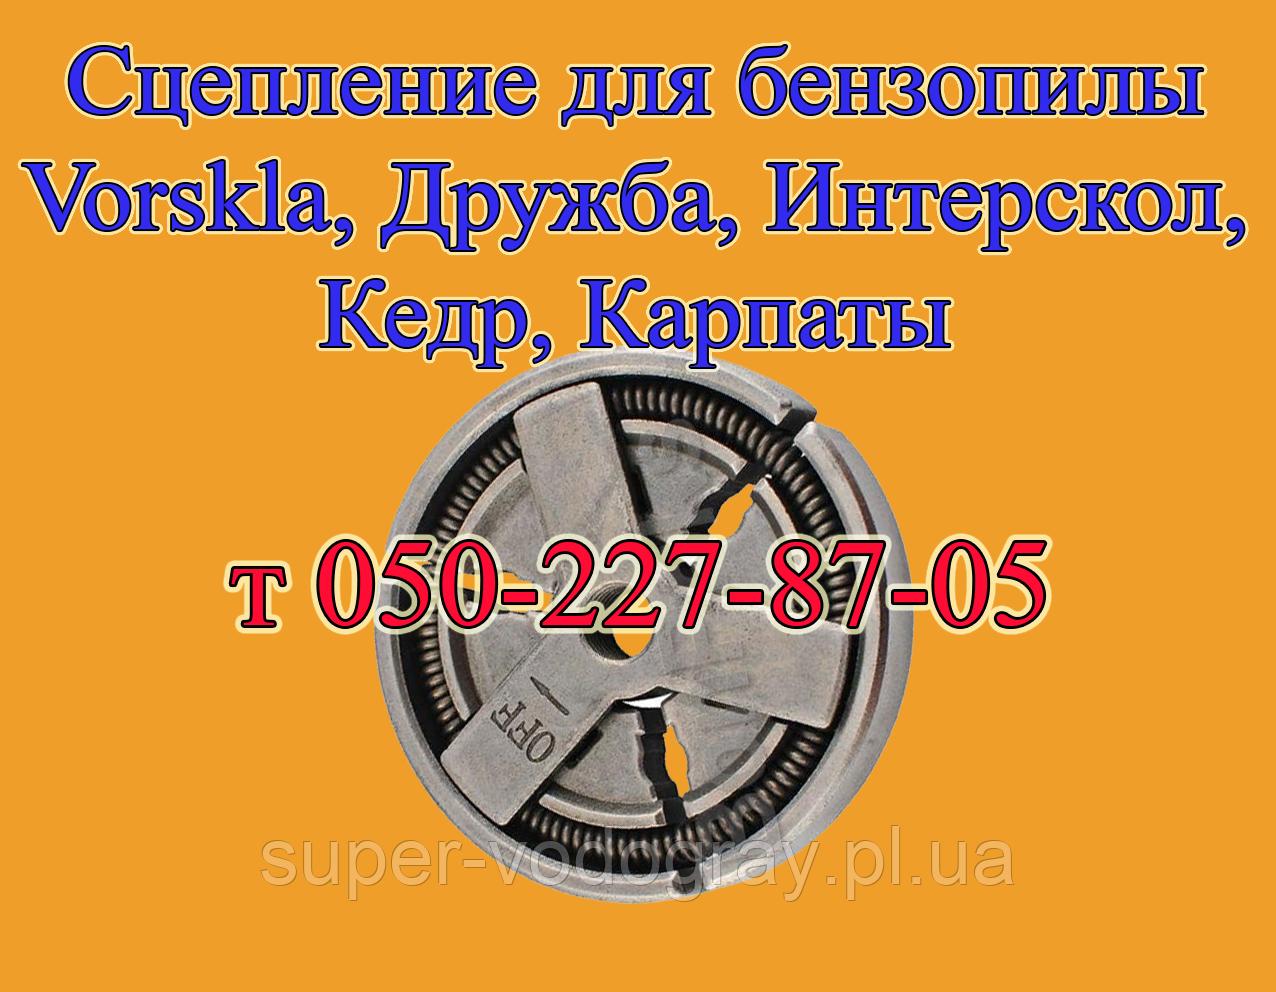 Зчеплення для бензопил Vorskla, Дружба, Интерскол, Кедр, Карпати